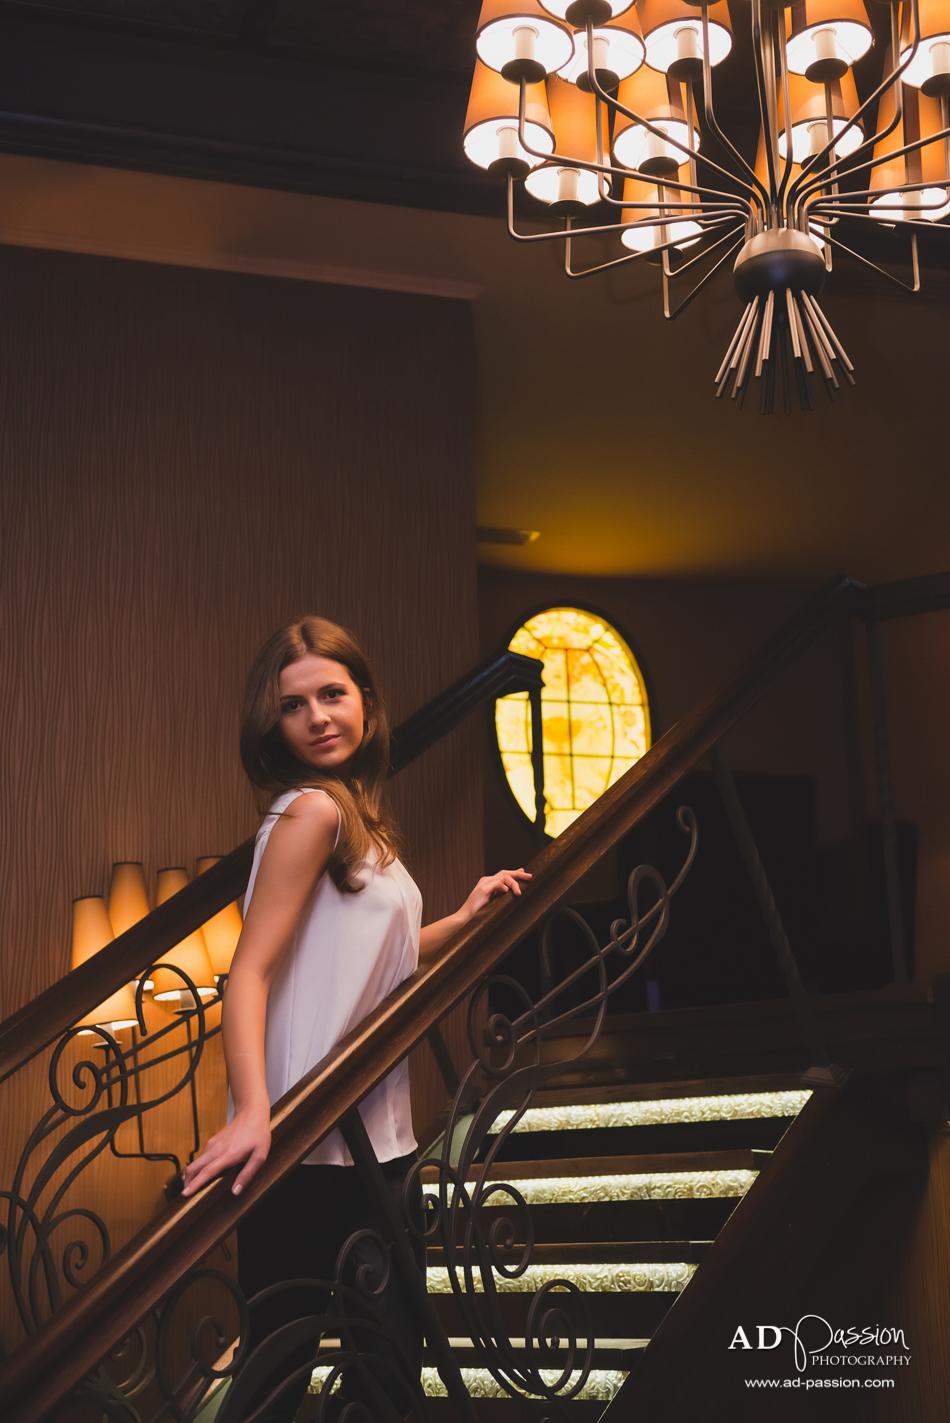 AD Passion Photography | rahela_fotografie-portret-timisoara_0031 | Adelin, Dida, fotograf profesionist, fotograf de nunta, fotografie de nunta, fotograf Timisoara, fotograf Craiova, fotograf Bucuresti, fotograf Arad, nunta Timisoara, nunta Arad, nunta Bucuresti, nunta Craiova